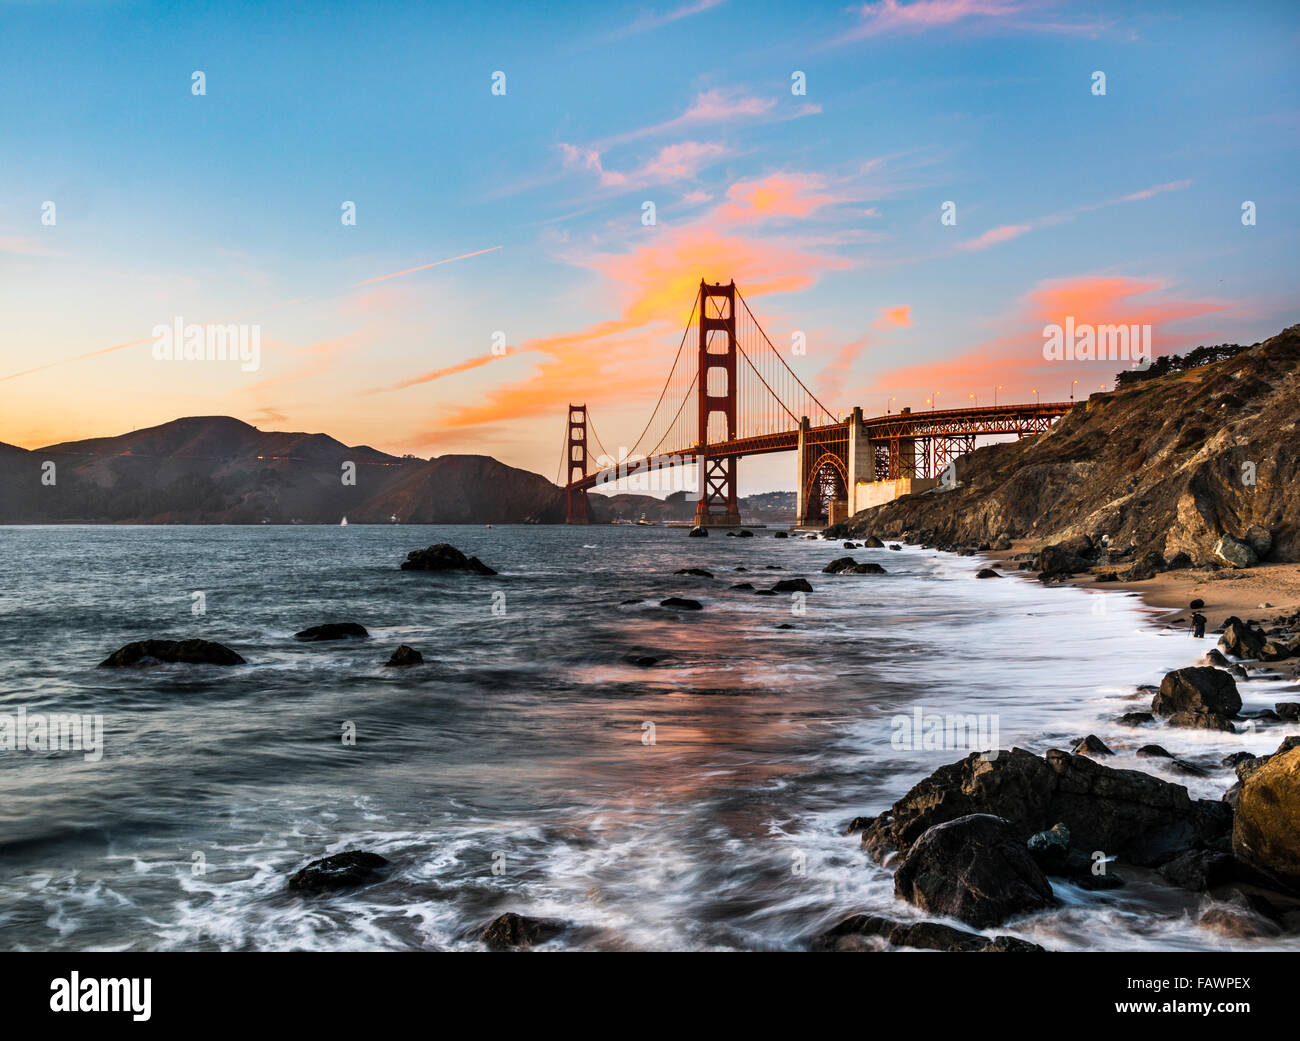 Le Golden Gate Bridge, Marshall's Beach, Sunset, côte rocheuse, San Francisco, États-Unis Photo Stock